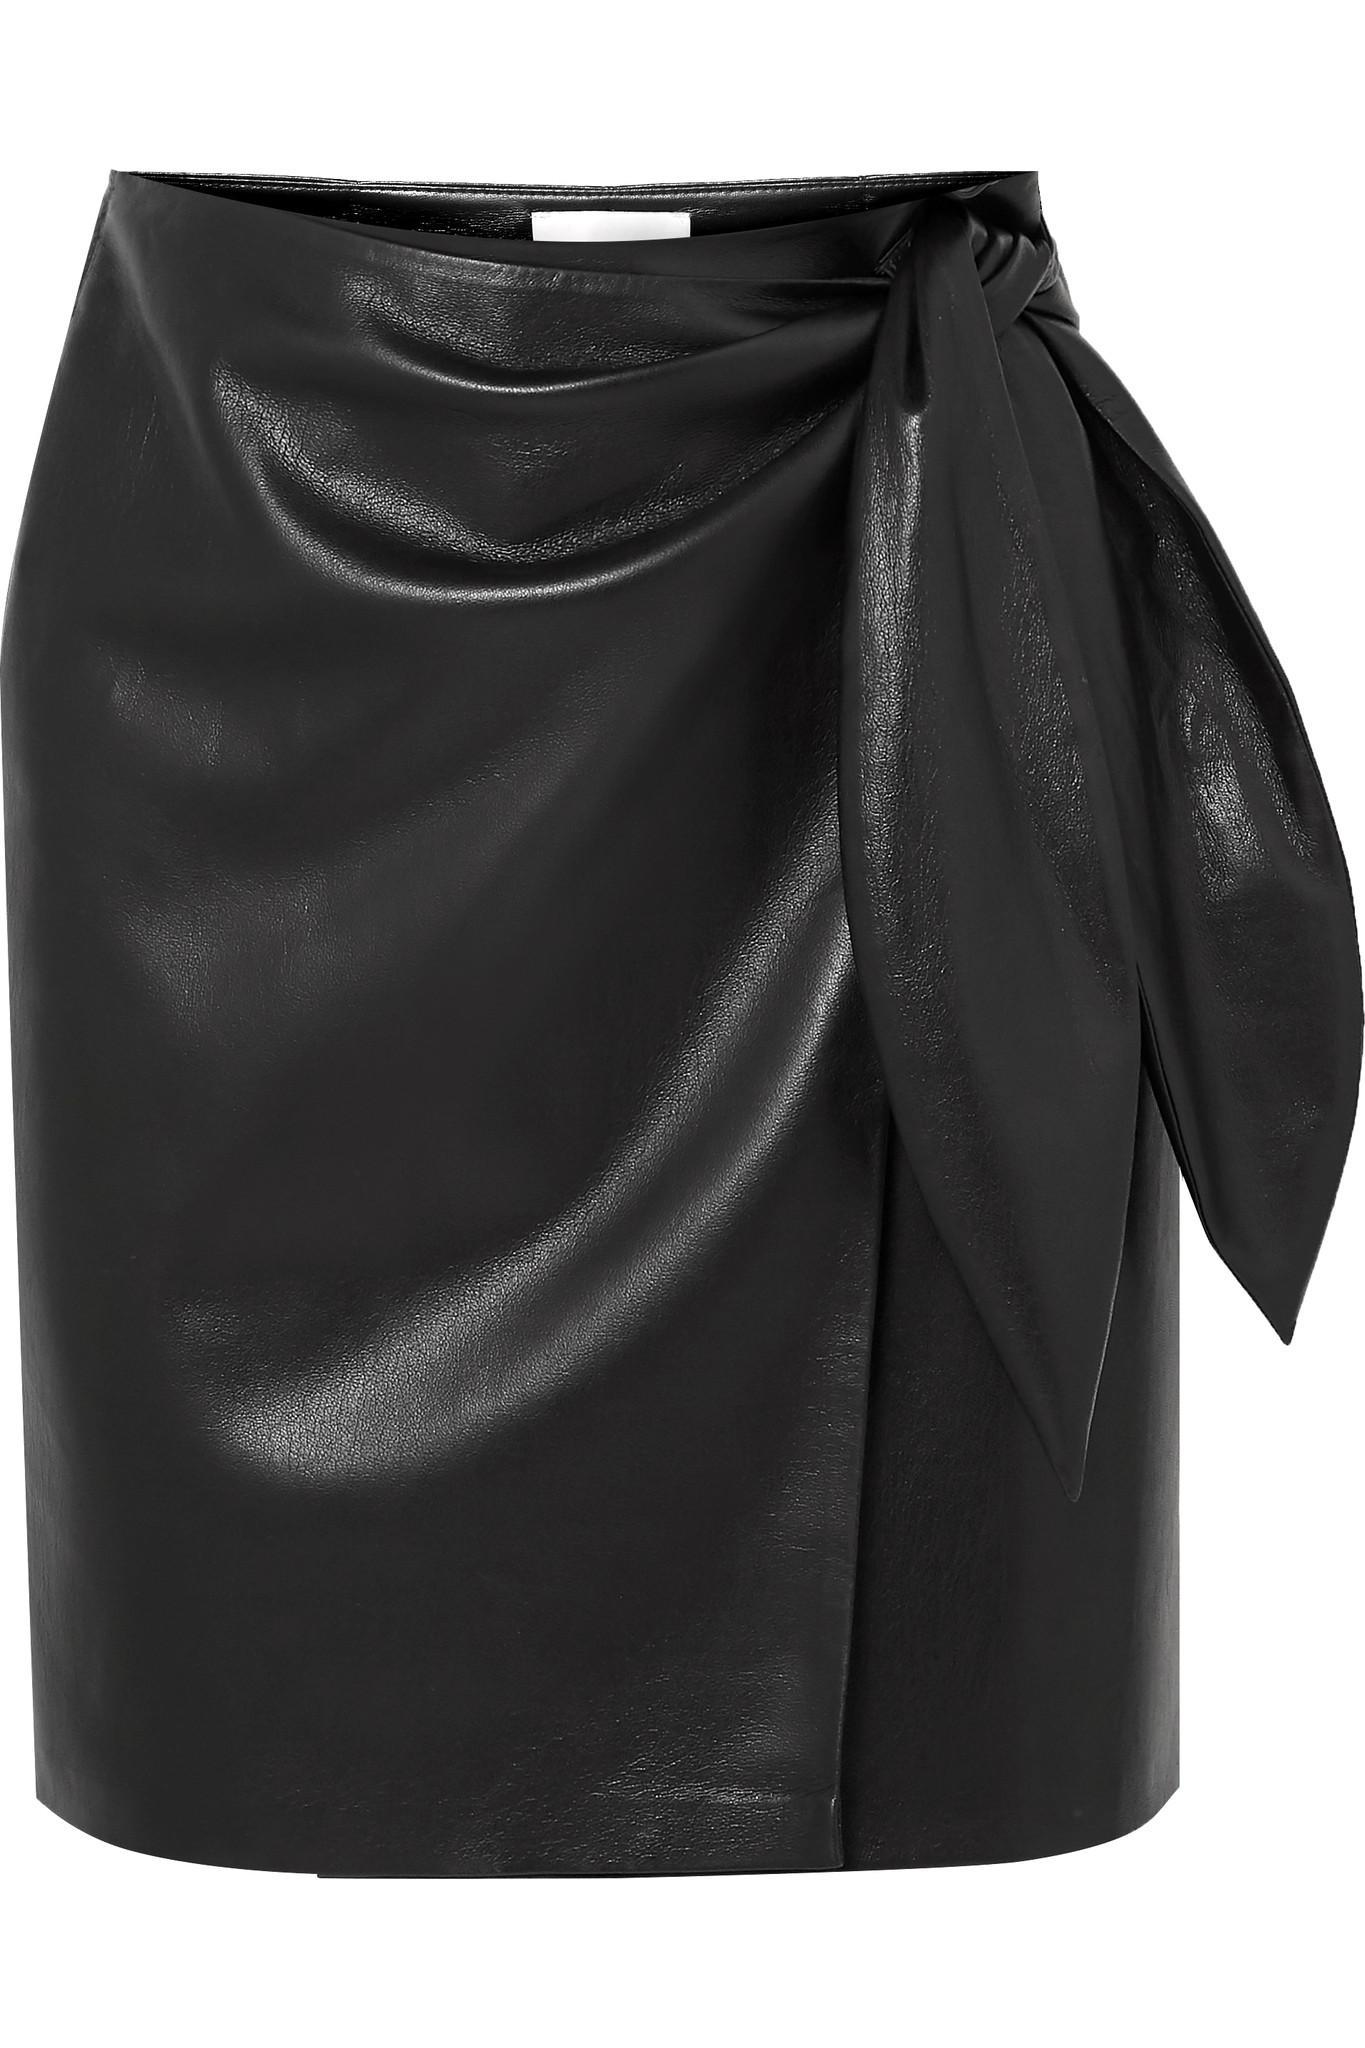 7fa71f33e2a6 Lyst - Nanushka Iowa Vegan Faux Leather Wrap Mini Skirt in Black